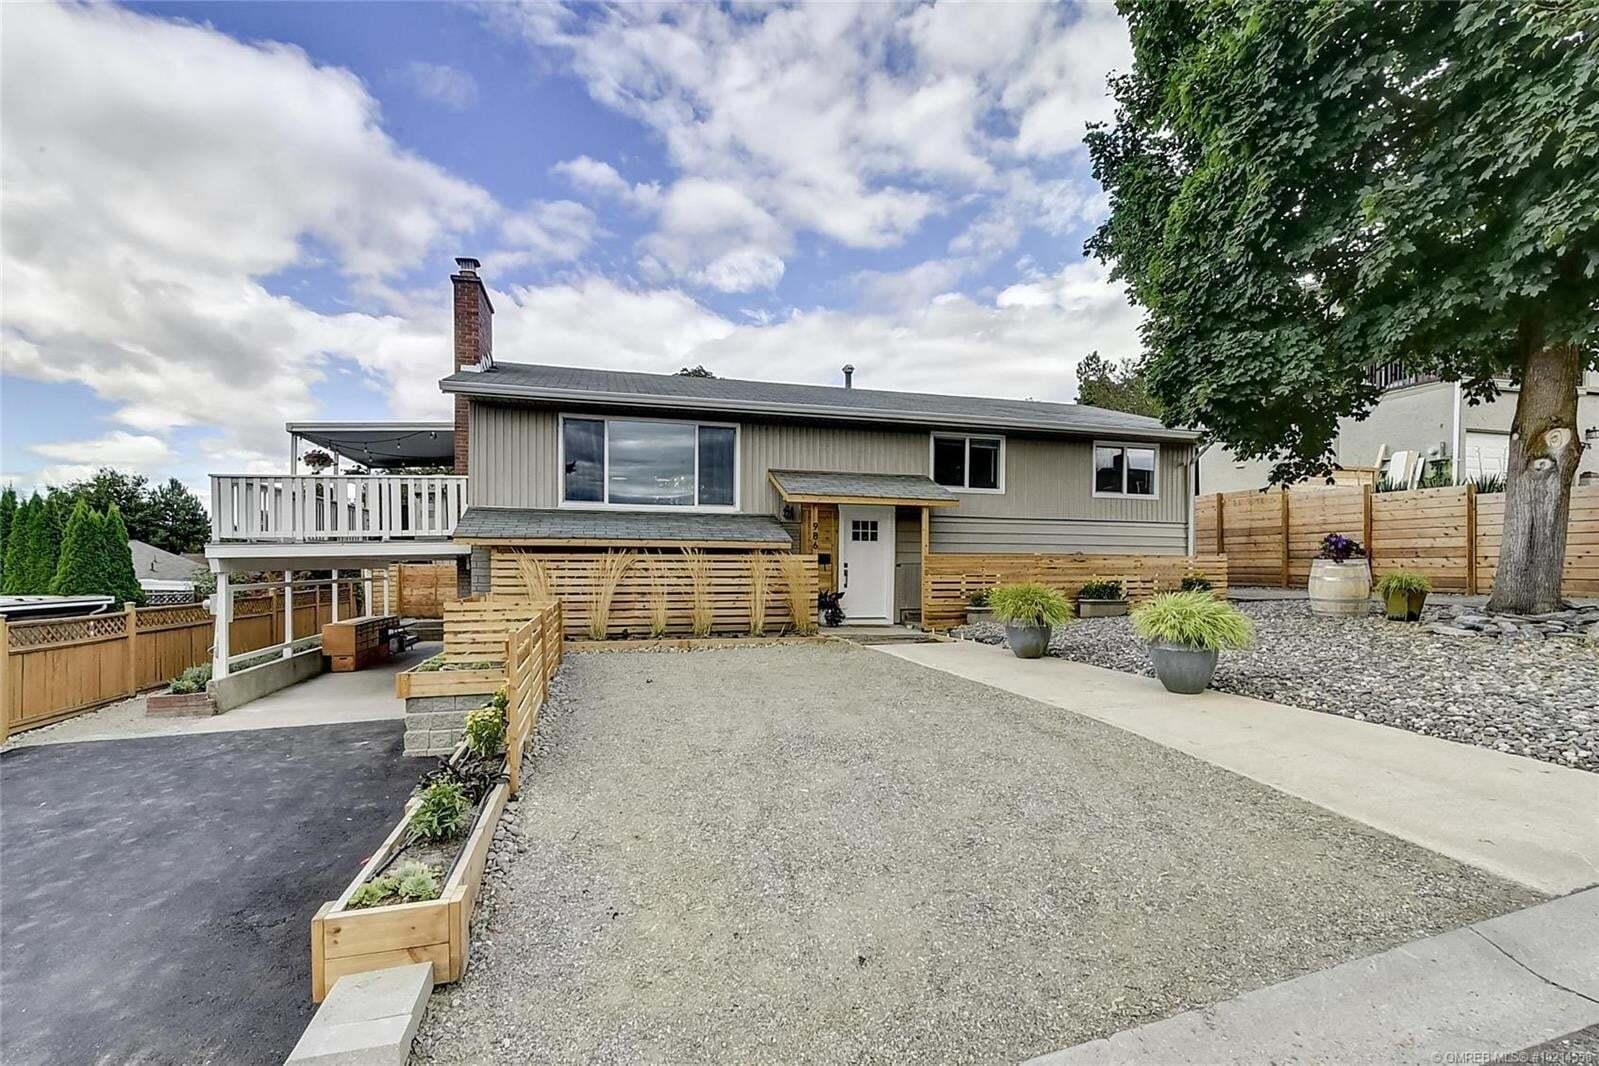 House for sale at 986 Garland St Kelowna British Columbia - MLS: 10214558